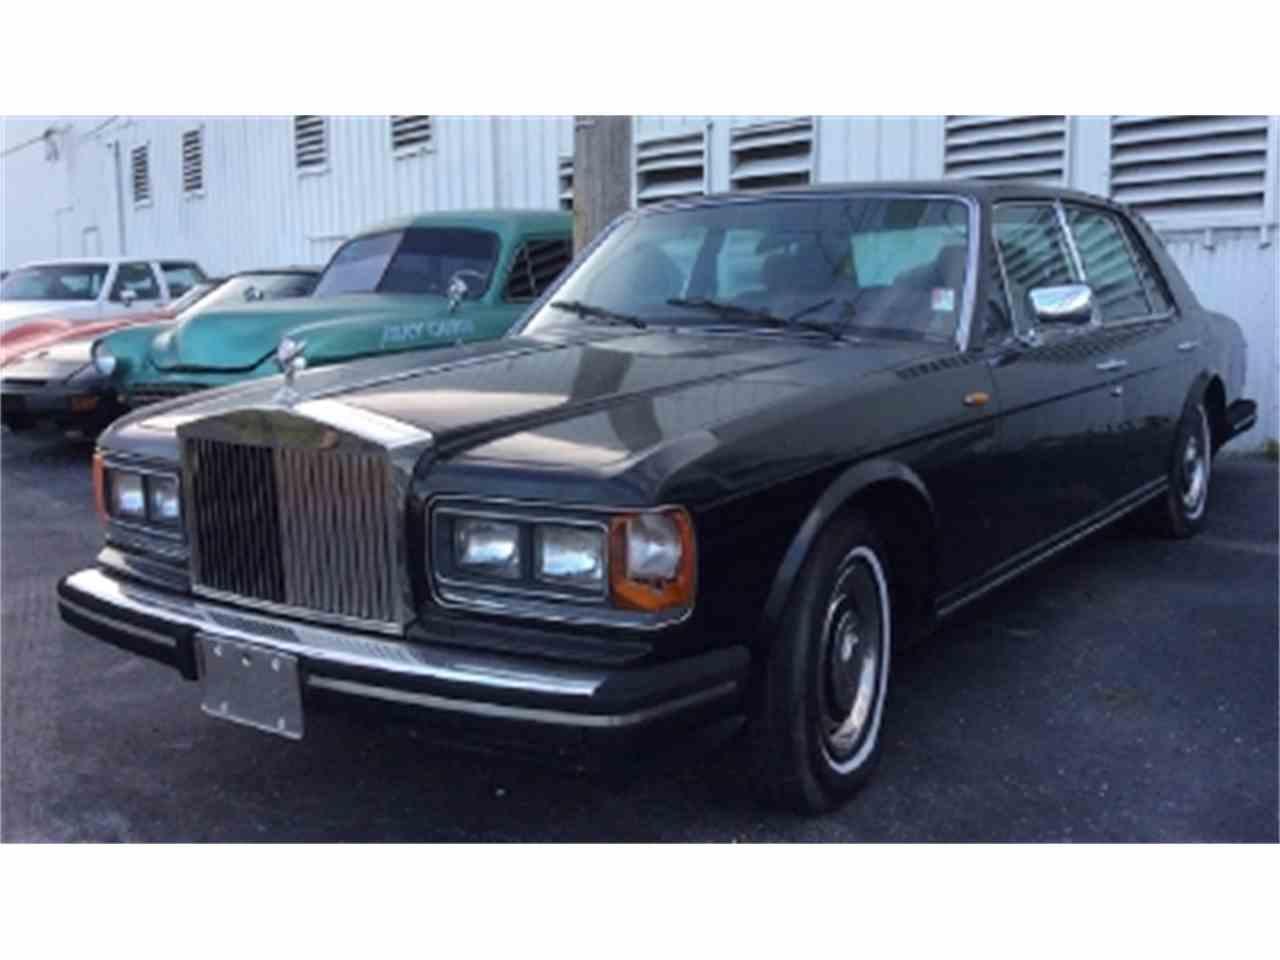 Large Picture of '83 Silver Spirit located in Miami Florida - $9,500.00 - E42A